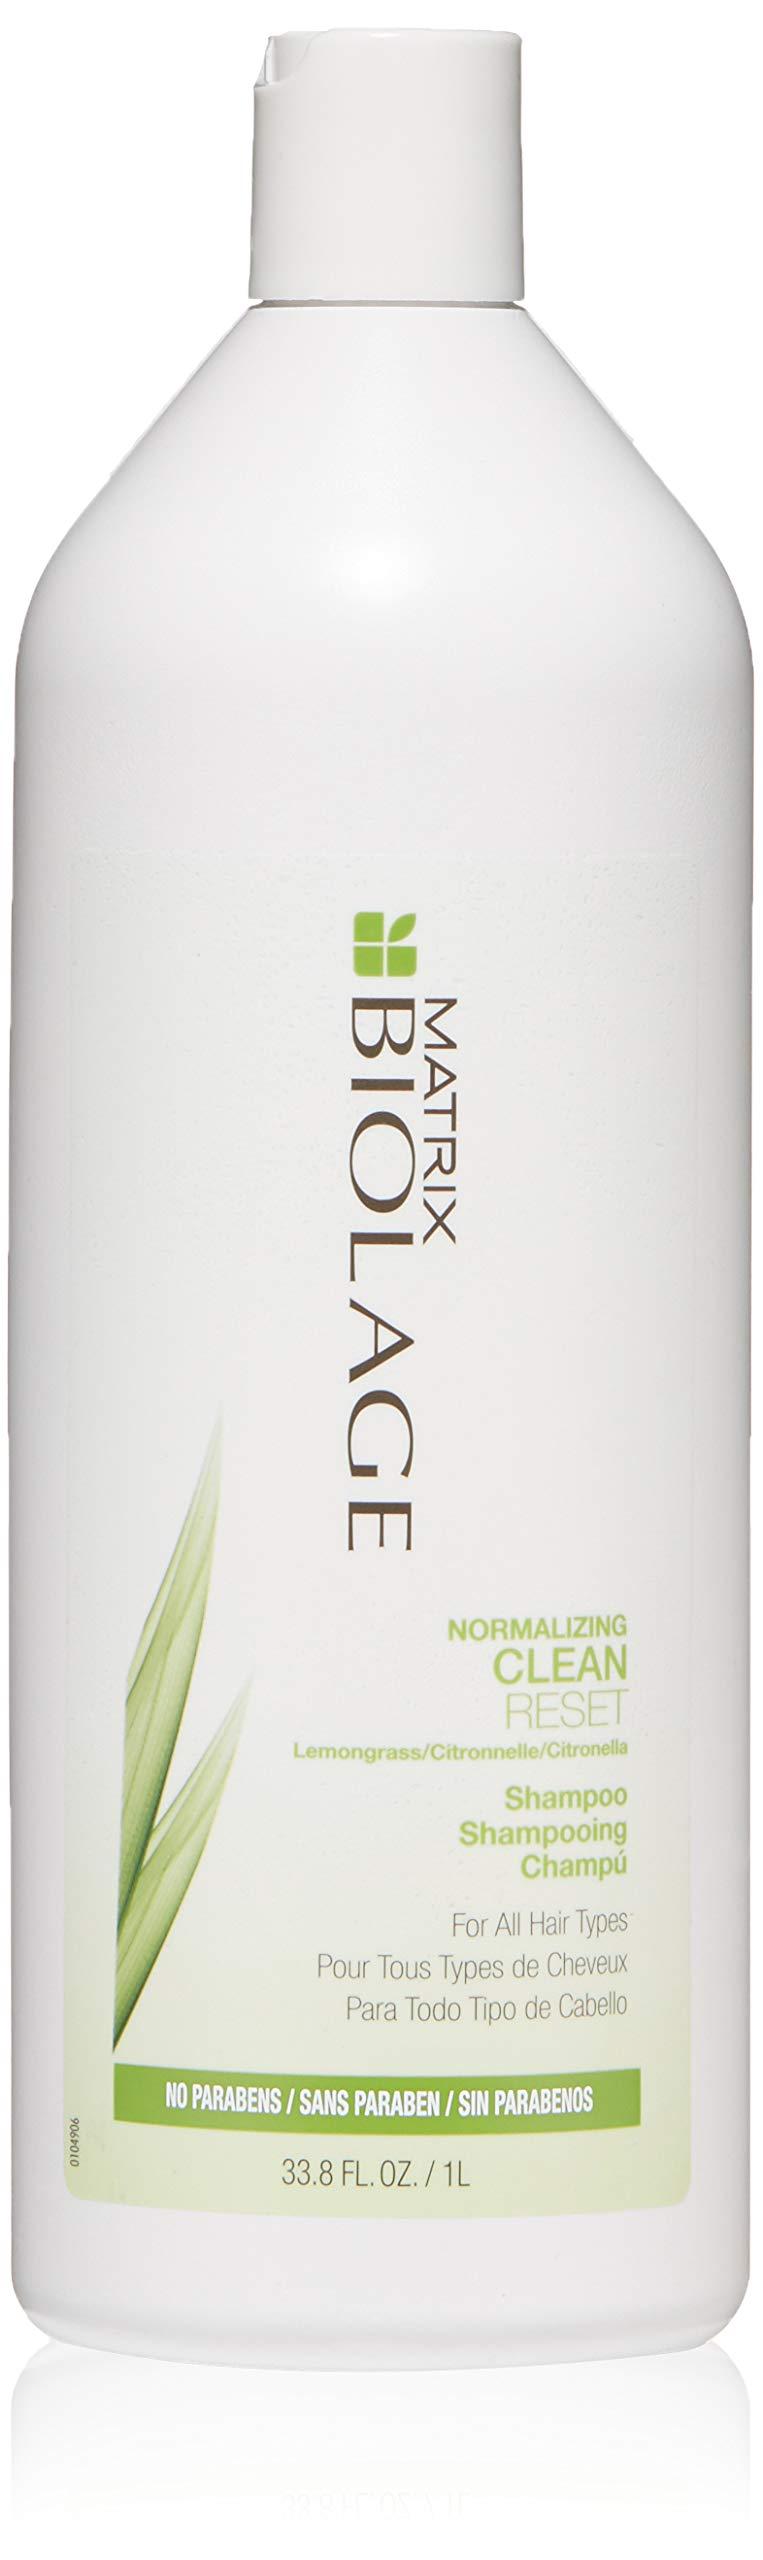 Biolage Cleanreset Normalizing Shampoo To Remove Buildup, 33.8 Fl. Oz. by BIOLAGE